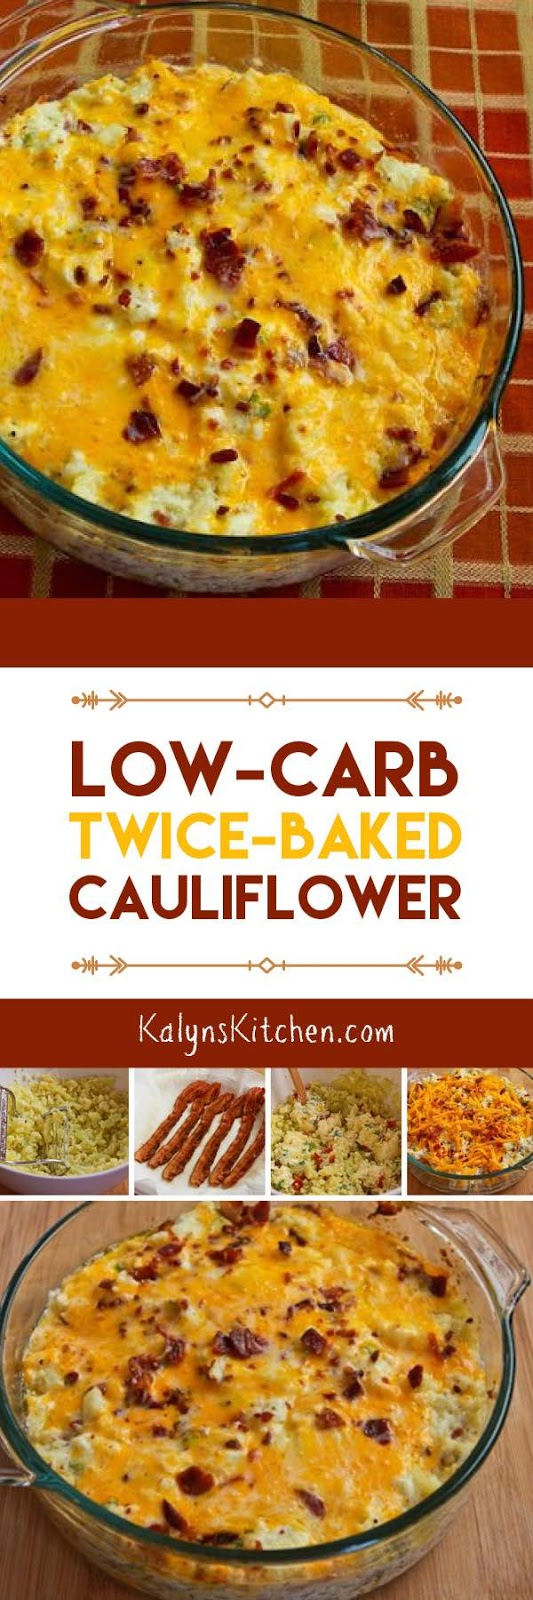 Low-Carb Twice-Baked Cauliflower found on KalynsKitchen.com